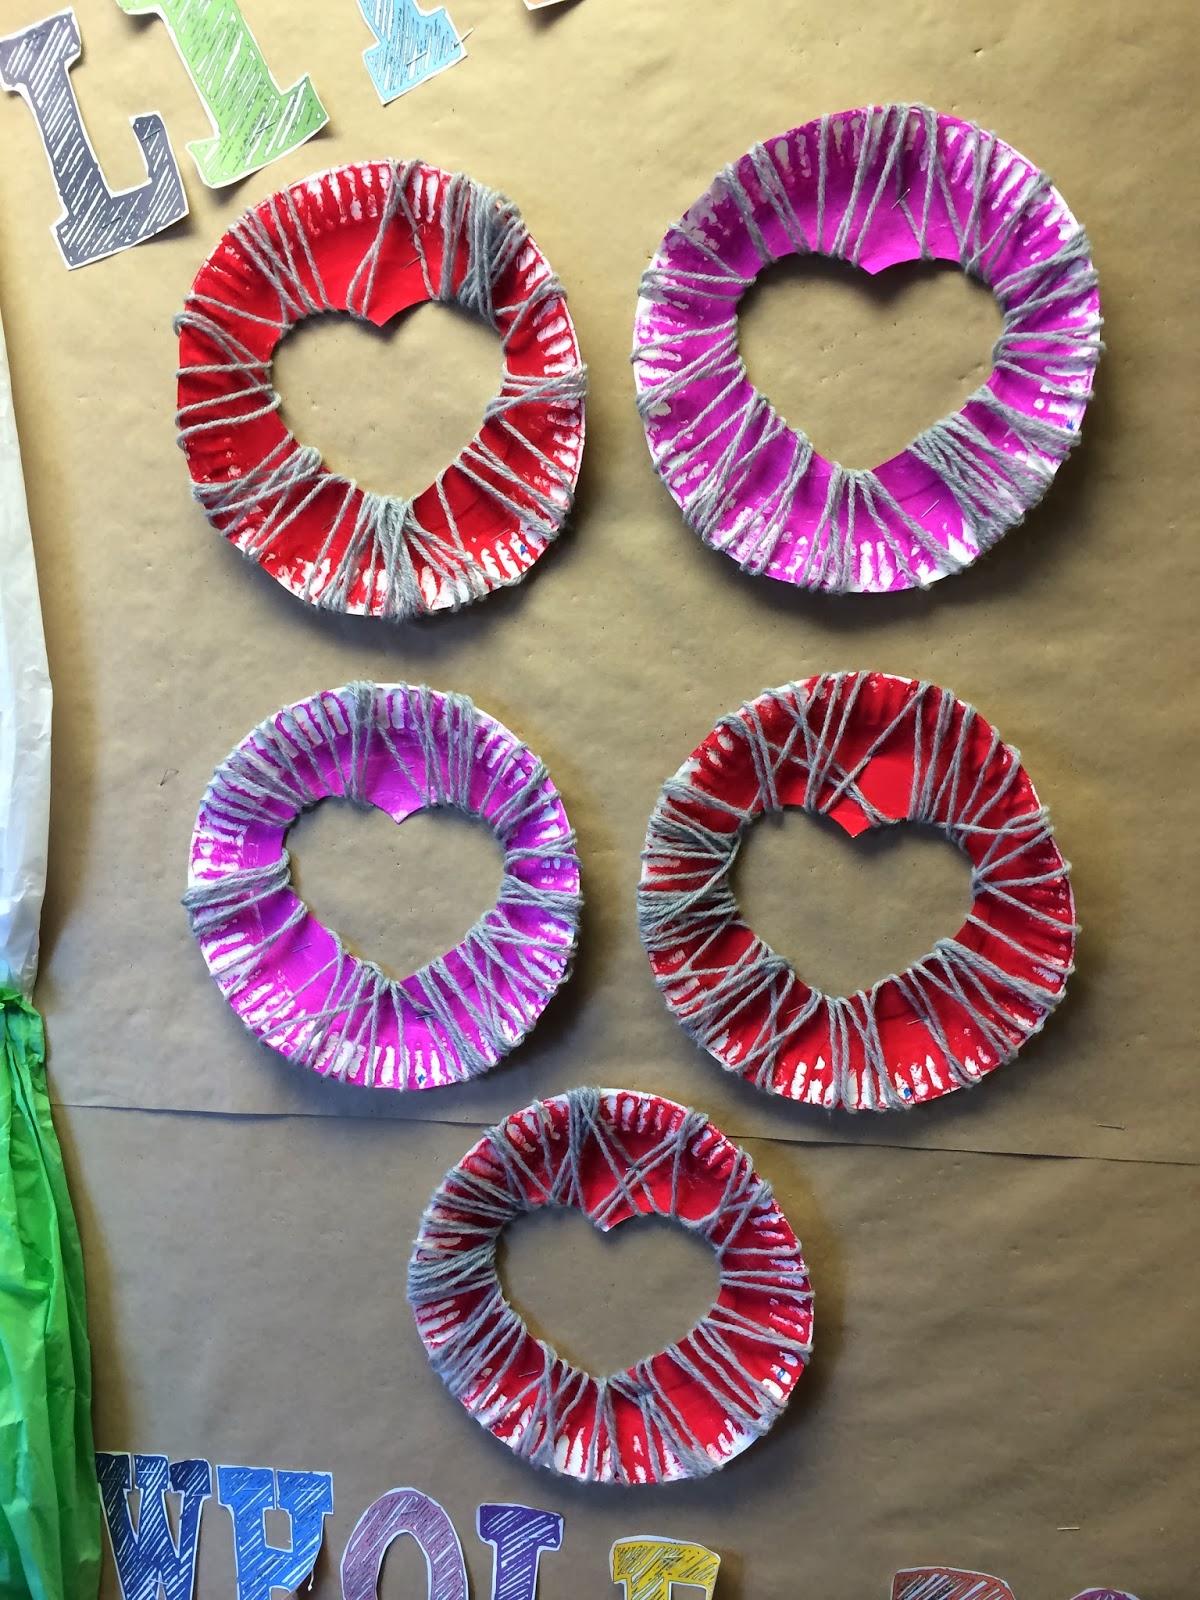 Teach Them To Fly Threaded Hearts Amp Photo Booths